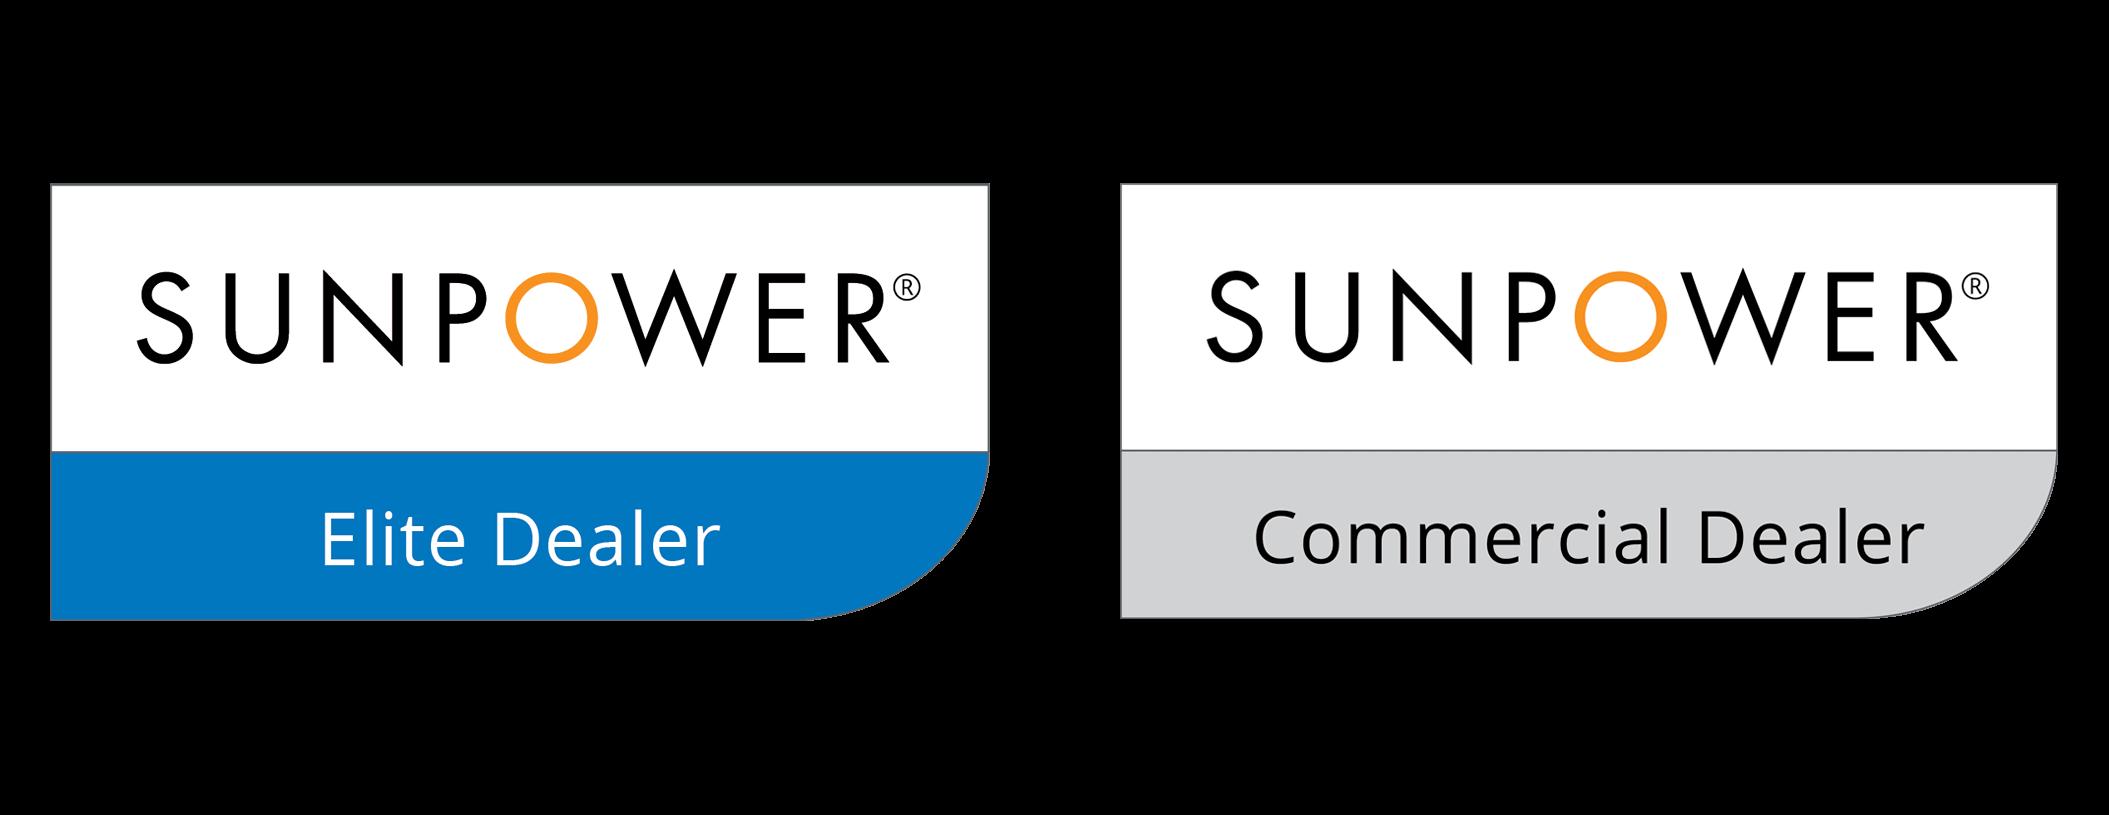 SunPower Logos.png